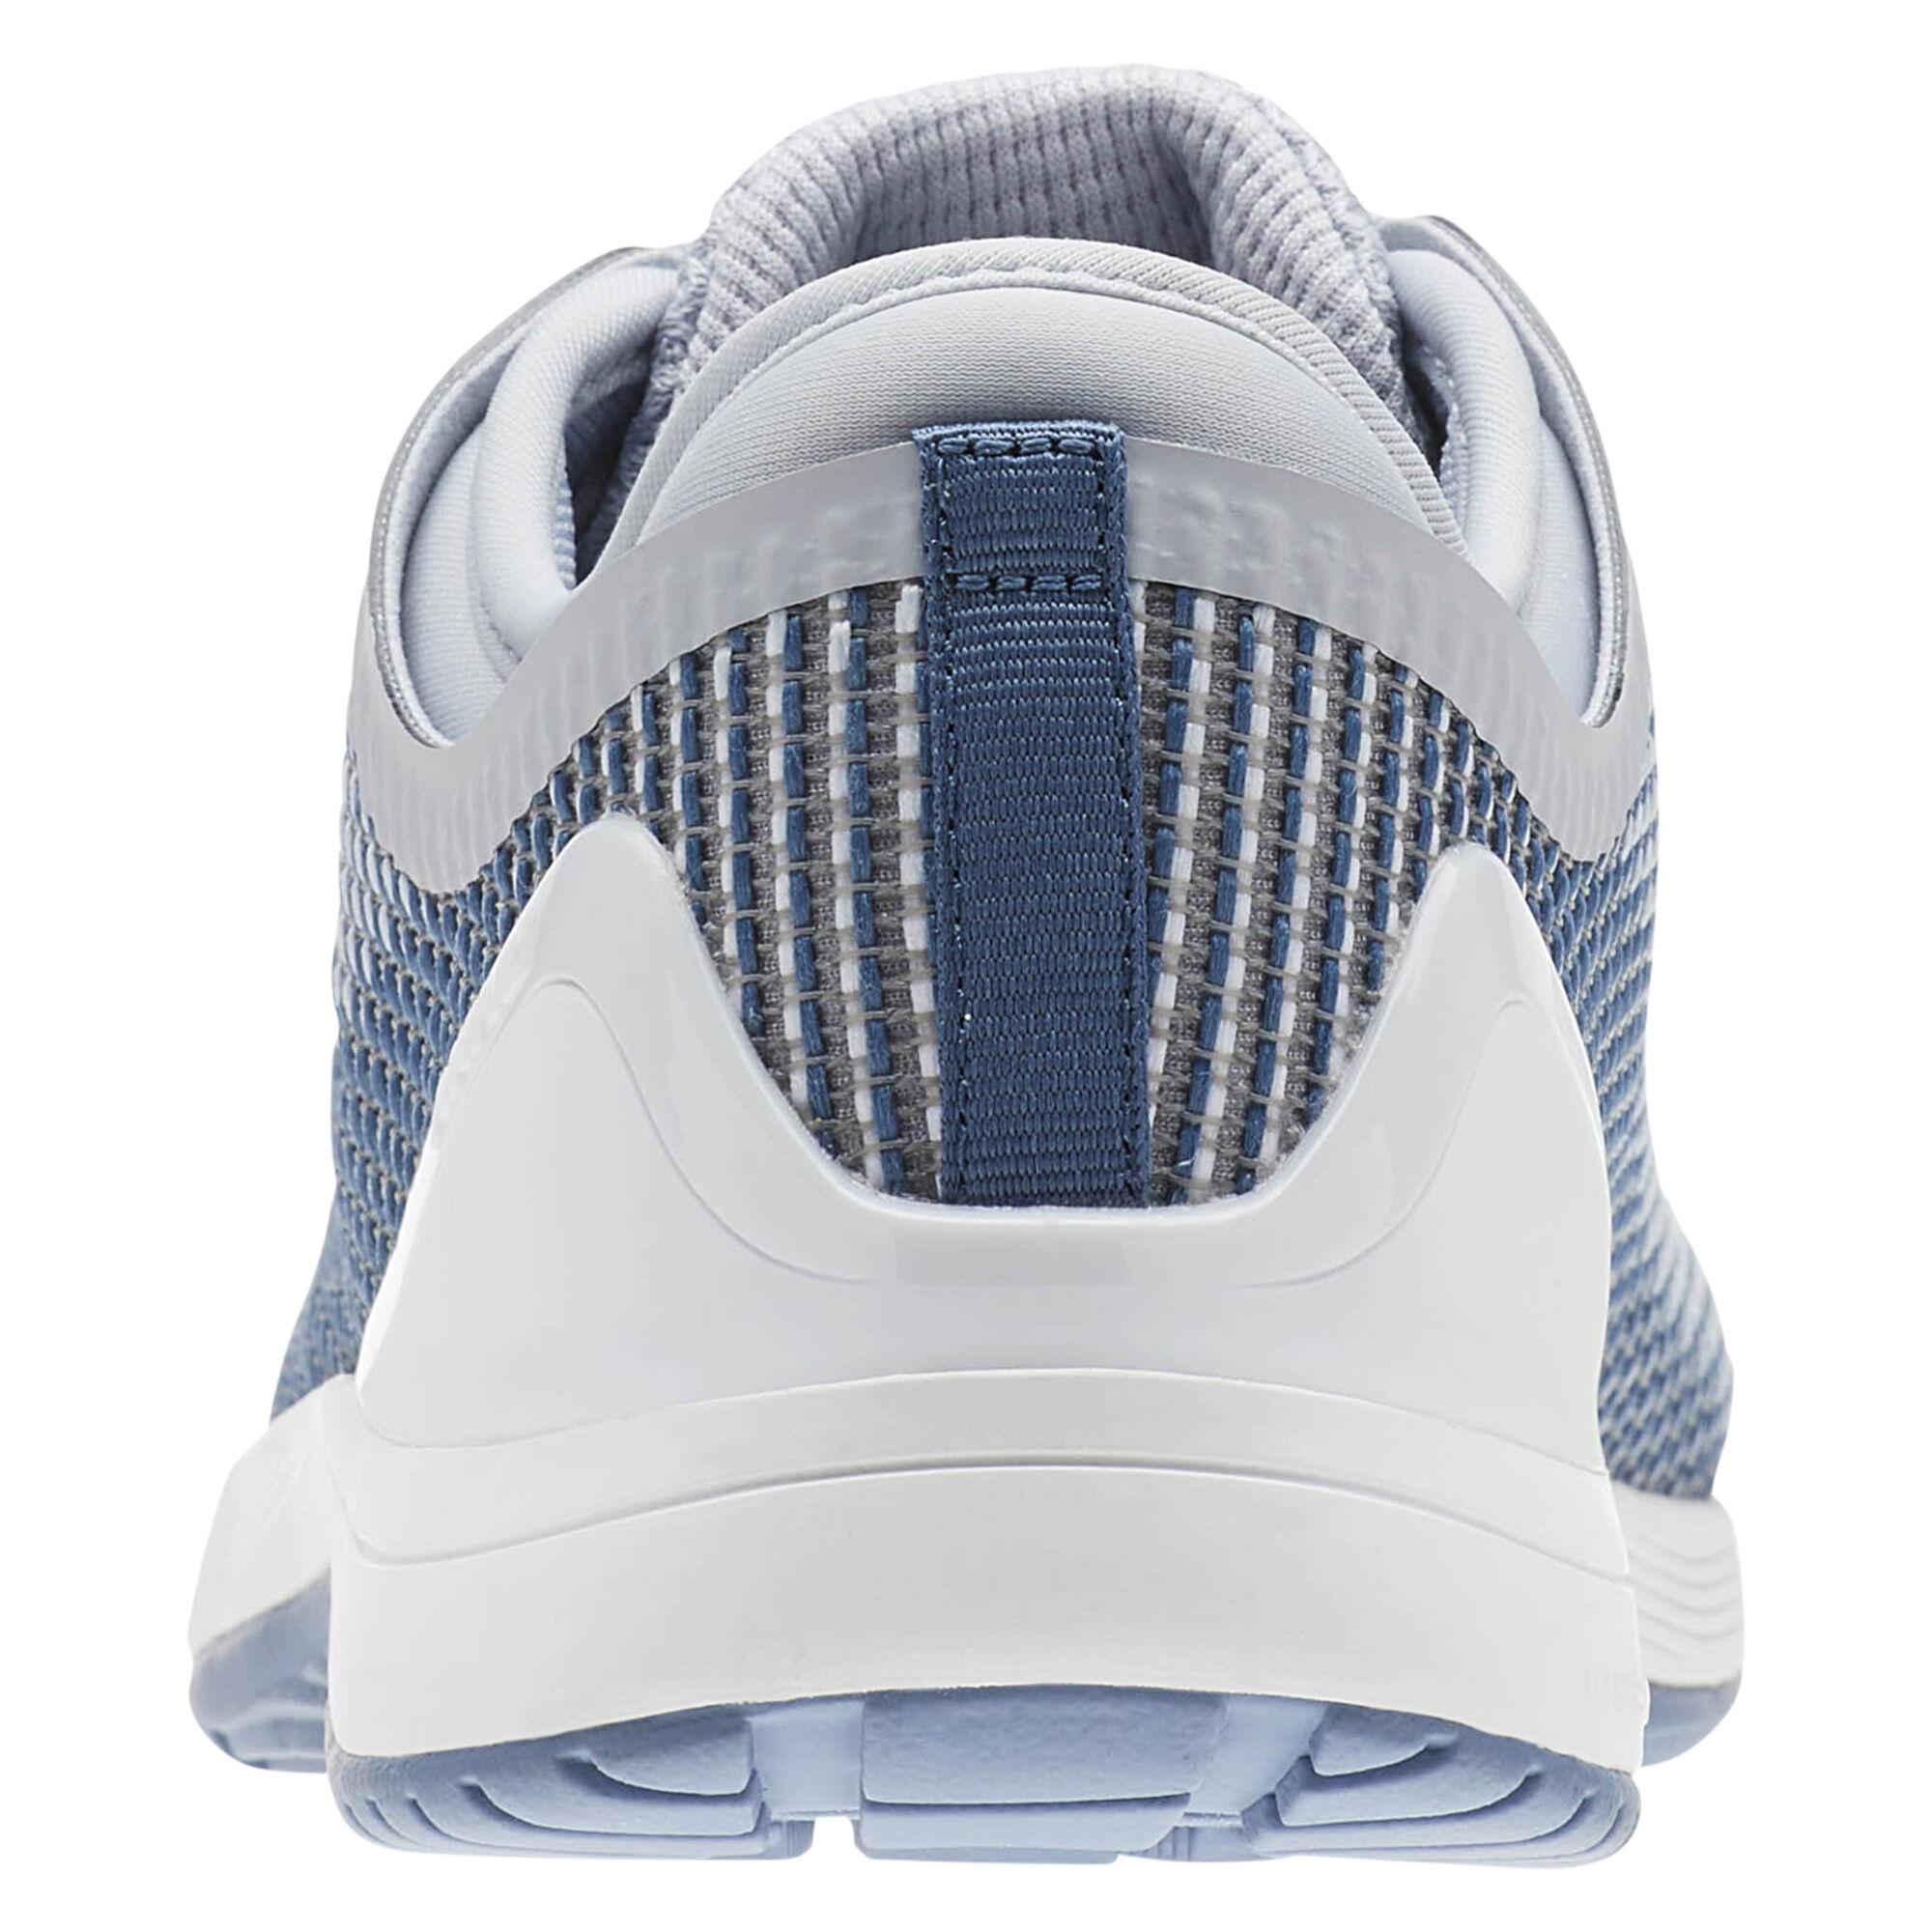 Reebok-Women-039-s-CrossFit-Nano-8-Flexweave-Shoes